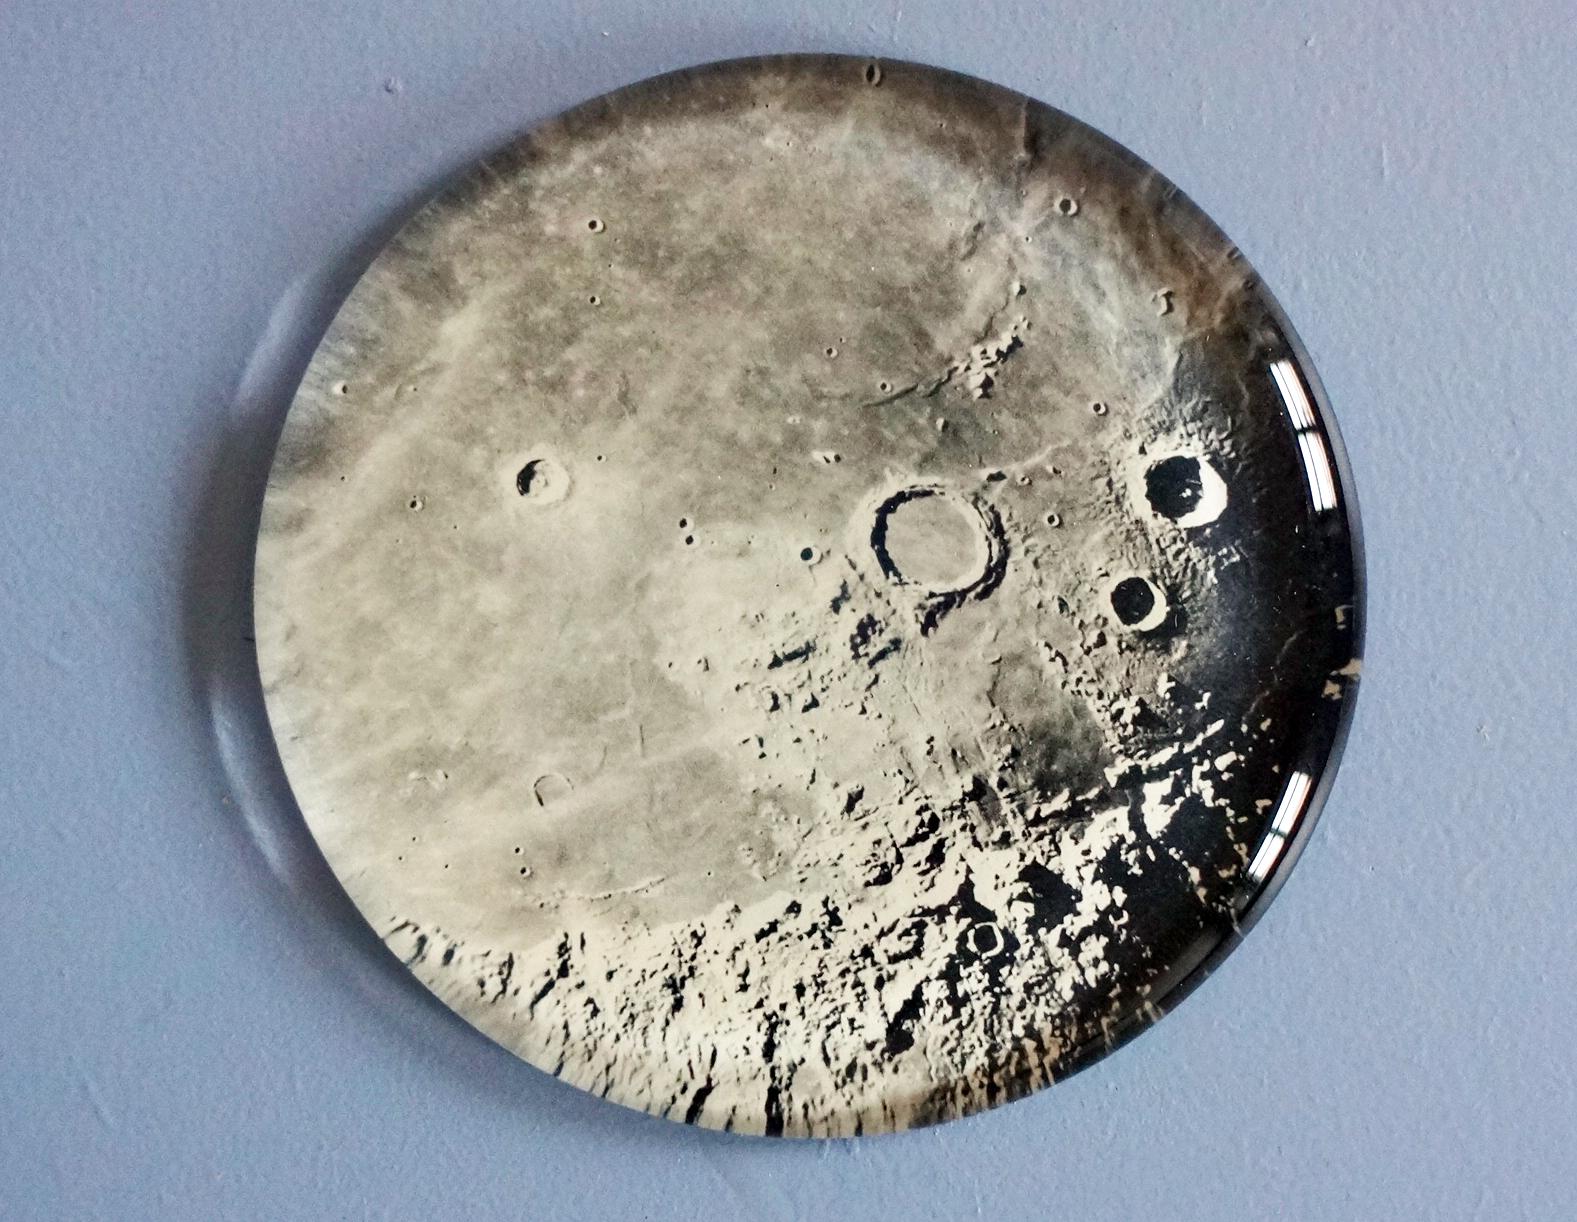 Källan, månen, detail (2016). Glas, papper, MDF. 10x10x1,5 cm. @Hillevi Berglund bildupphovsrätt (2017).